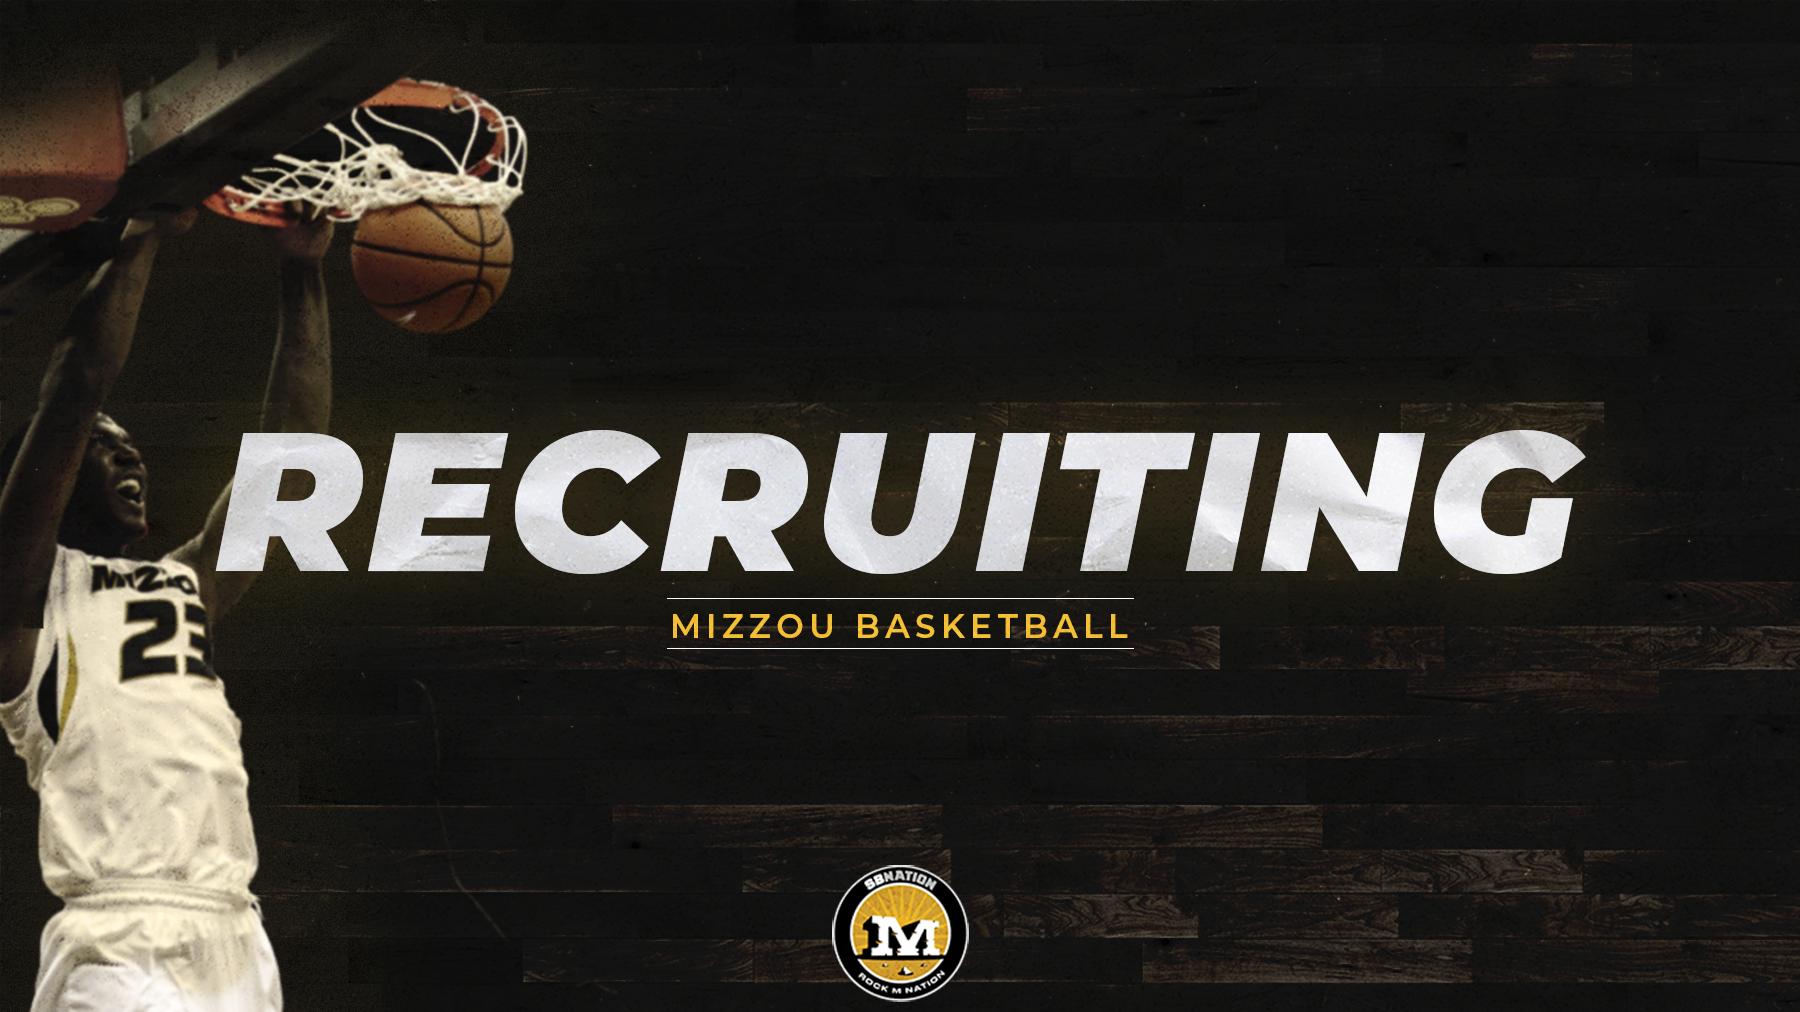 recruiting basketball